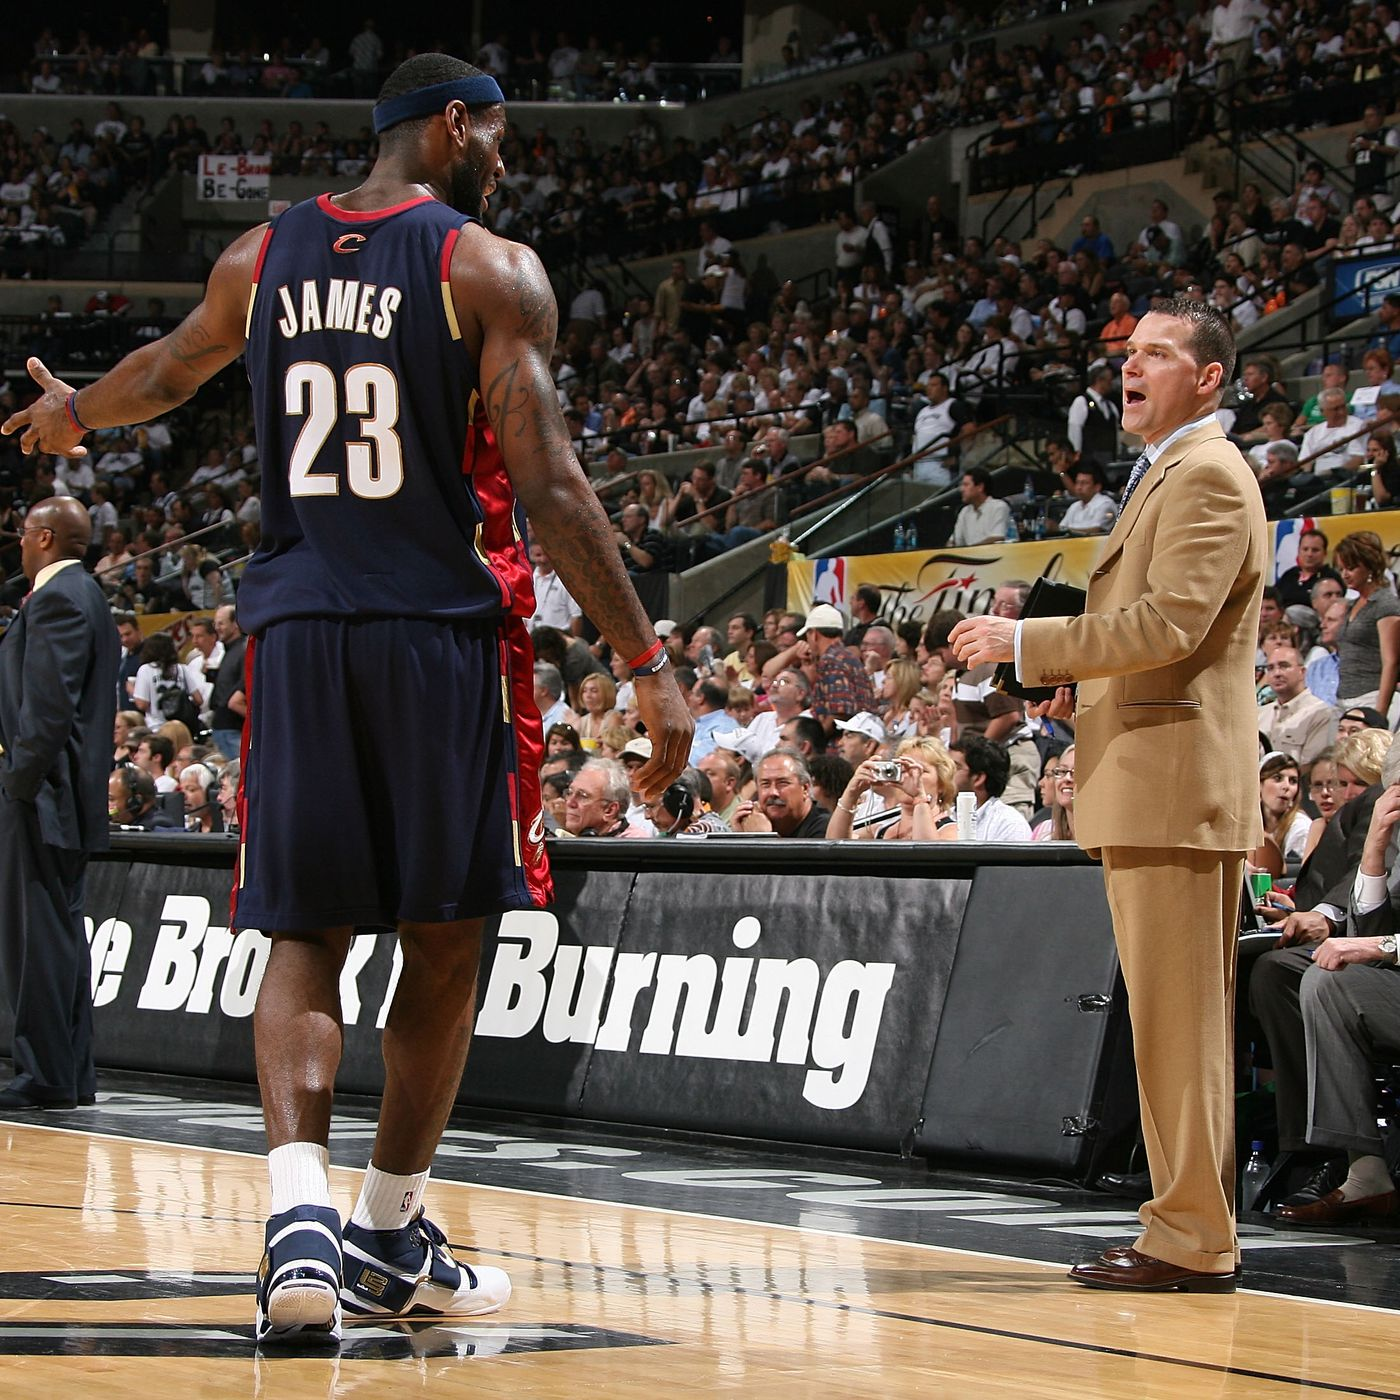 techo Tomar represalias Mesa final  Lakers News: Mike Malone says LeBron James doesn't have same 'killer  mentality' Michael Jordan had - Silver Screen and Roll